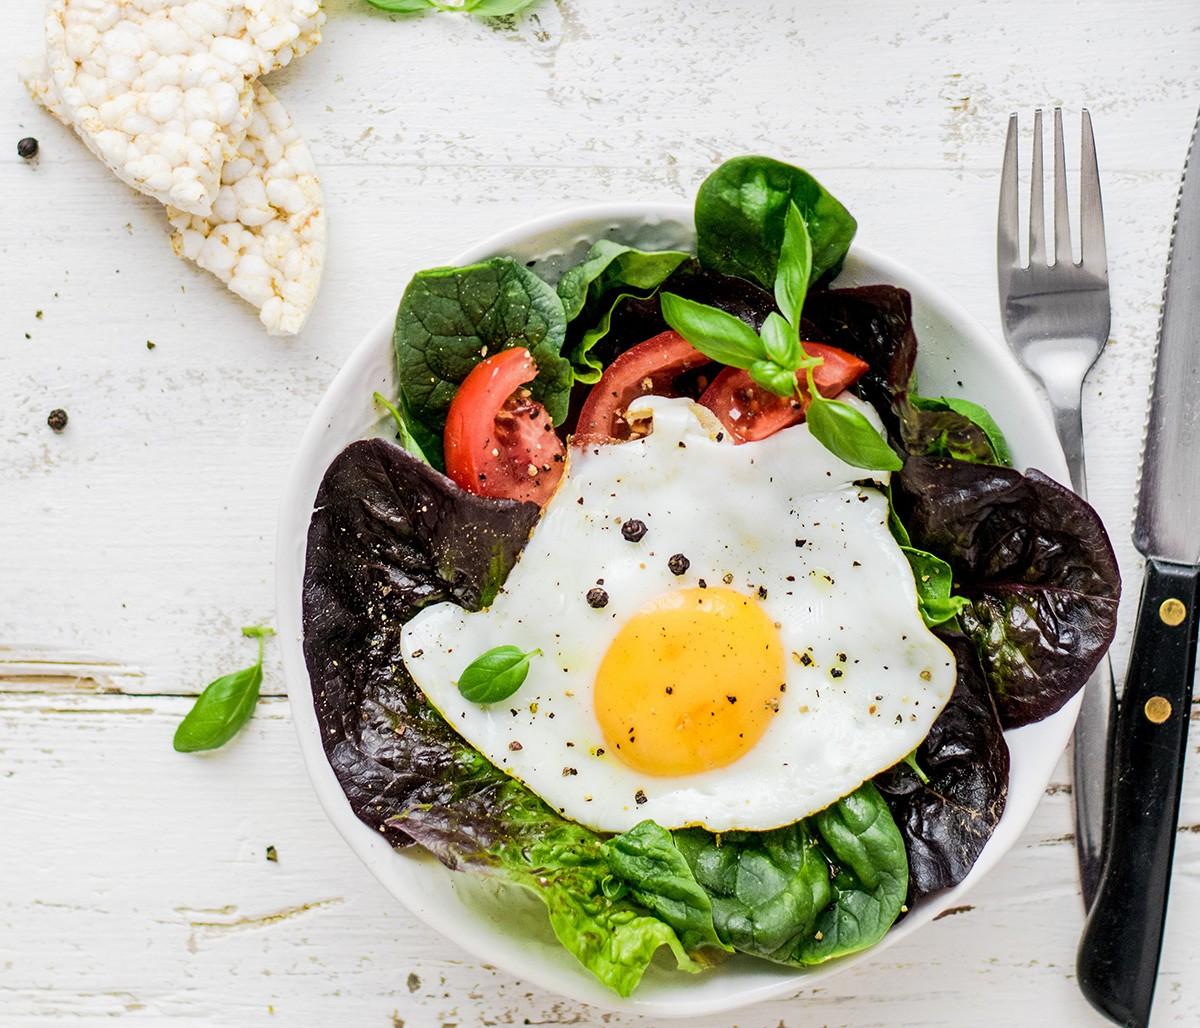 Breakfast eggs and salad